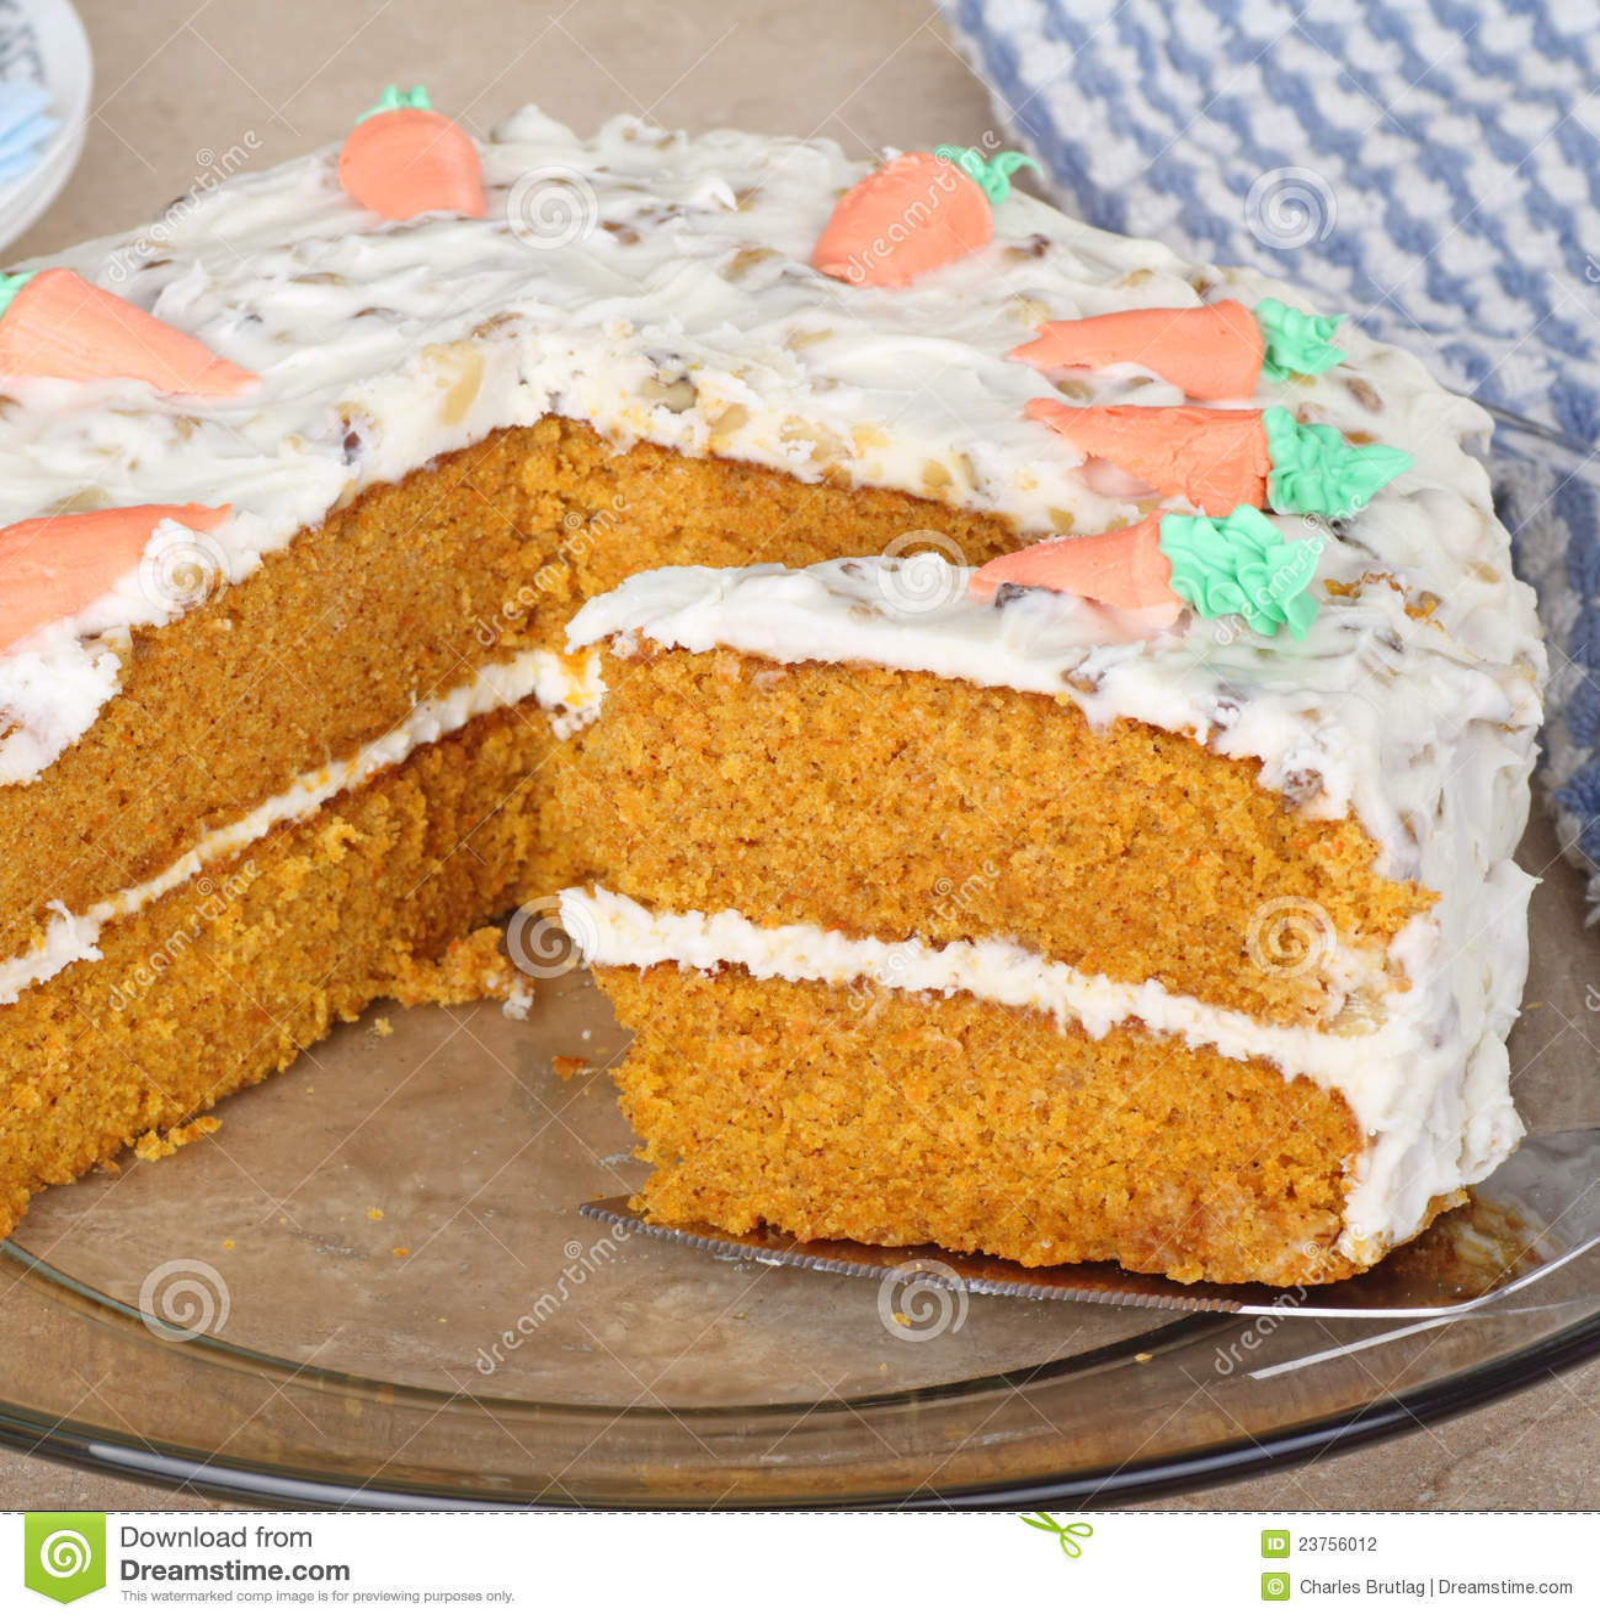 Fatia do bolo de camada da cenoura